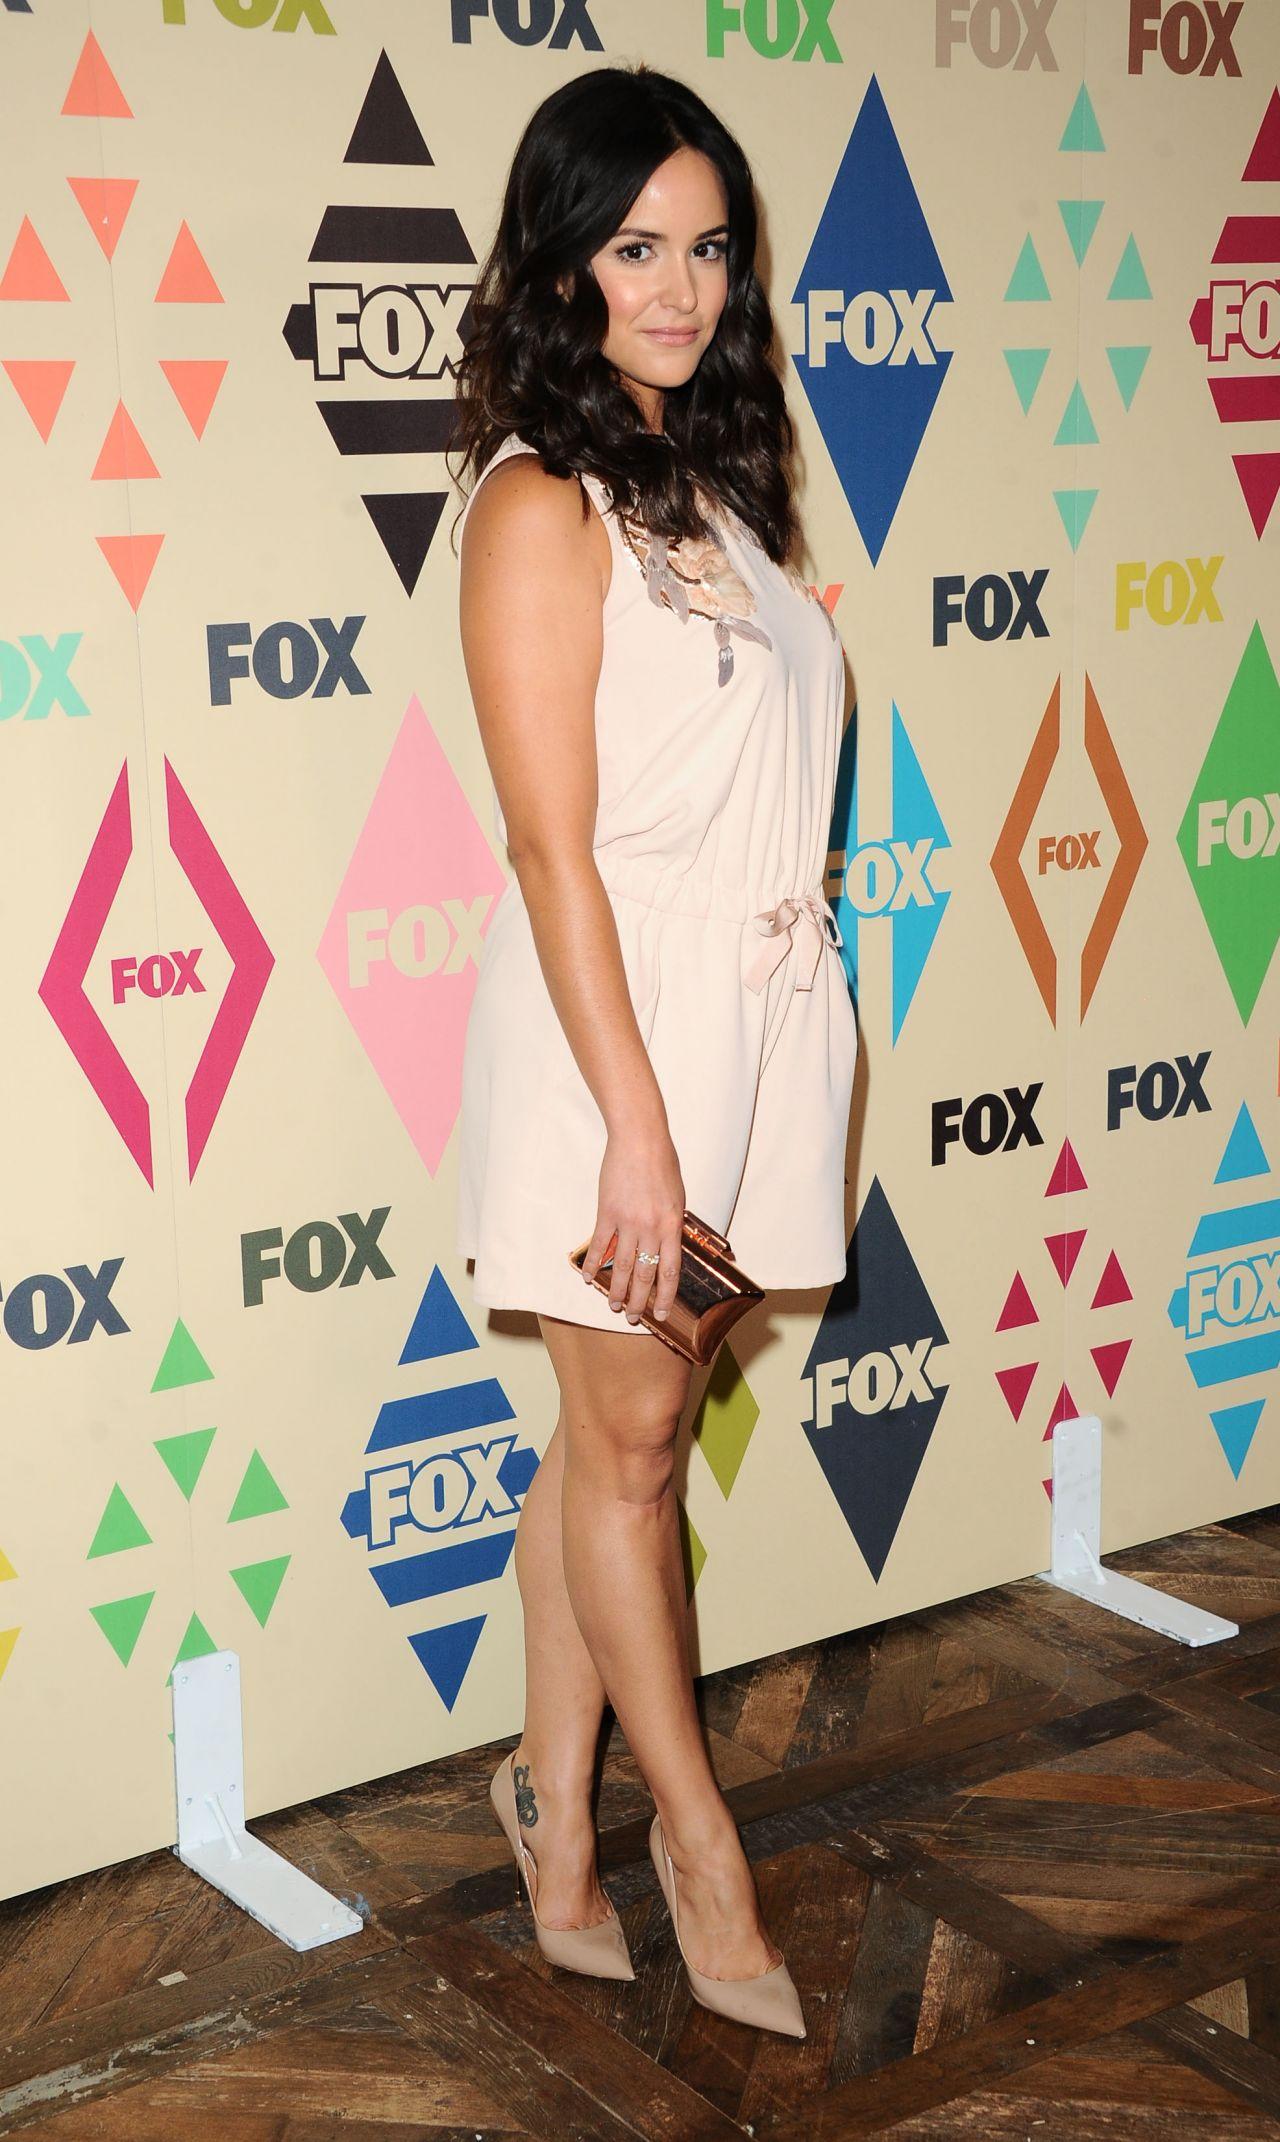 Melissa Fumero Fox Summer 2015 Tca Party In West Hollywood